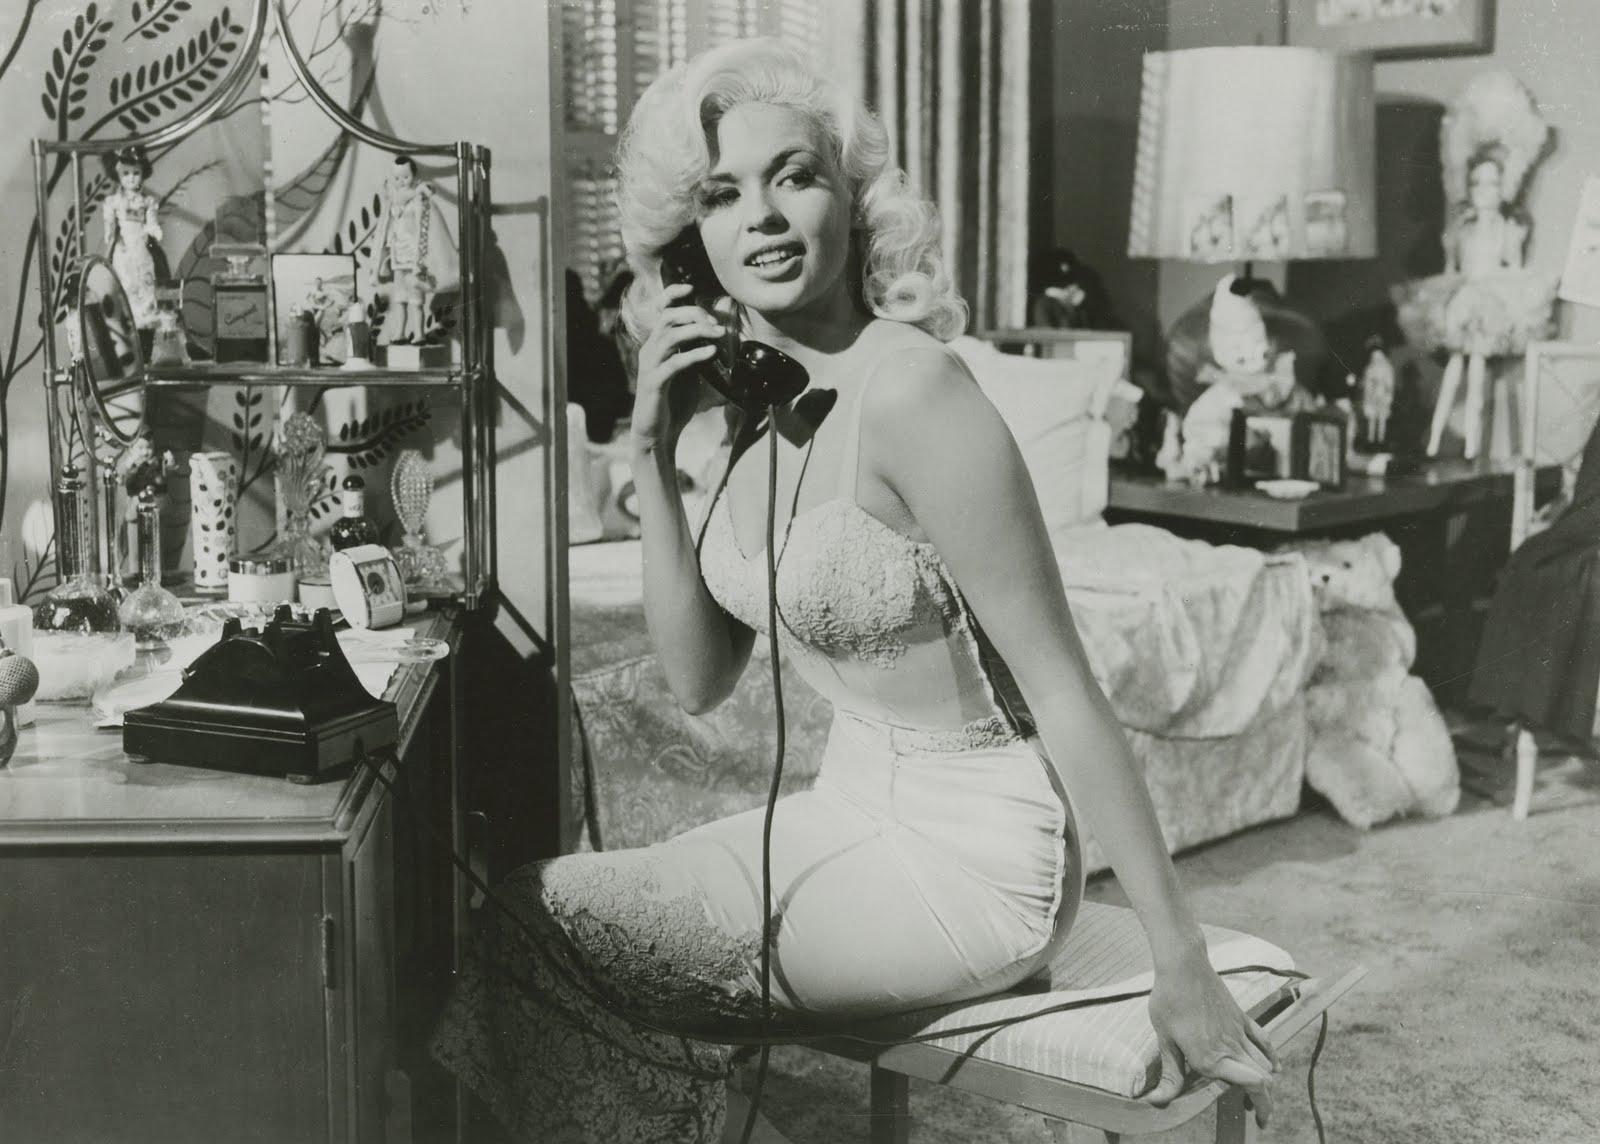 Vivian Velez Porn Complete stirred, straight up, with a twist: blonde on a wire